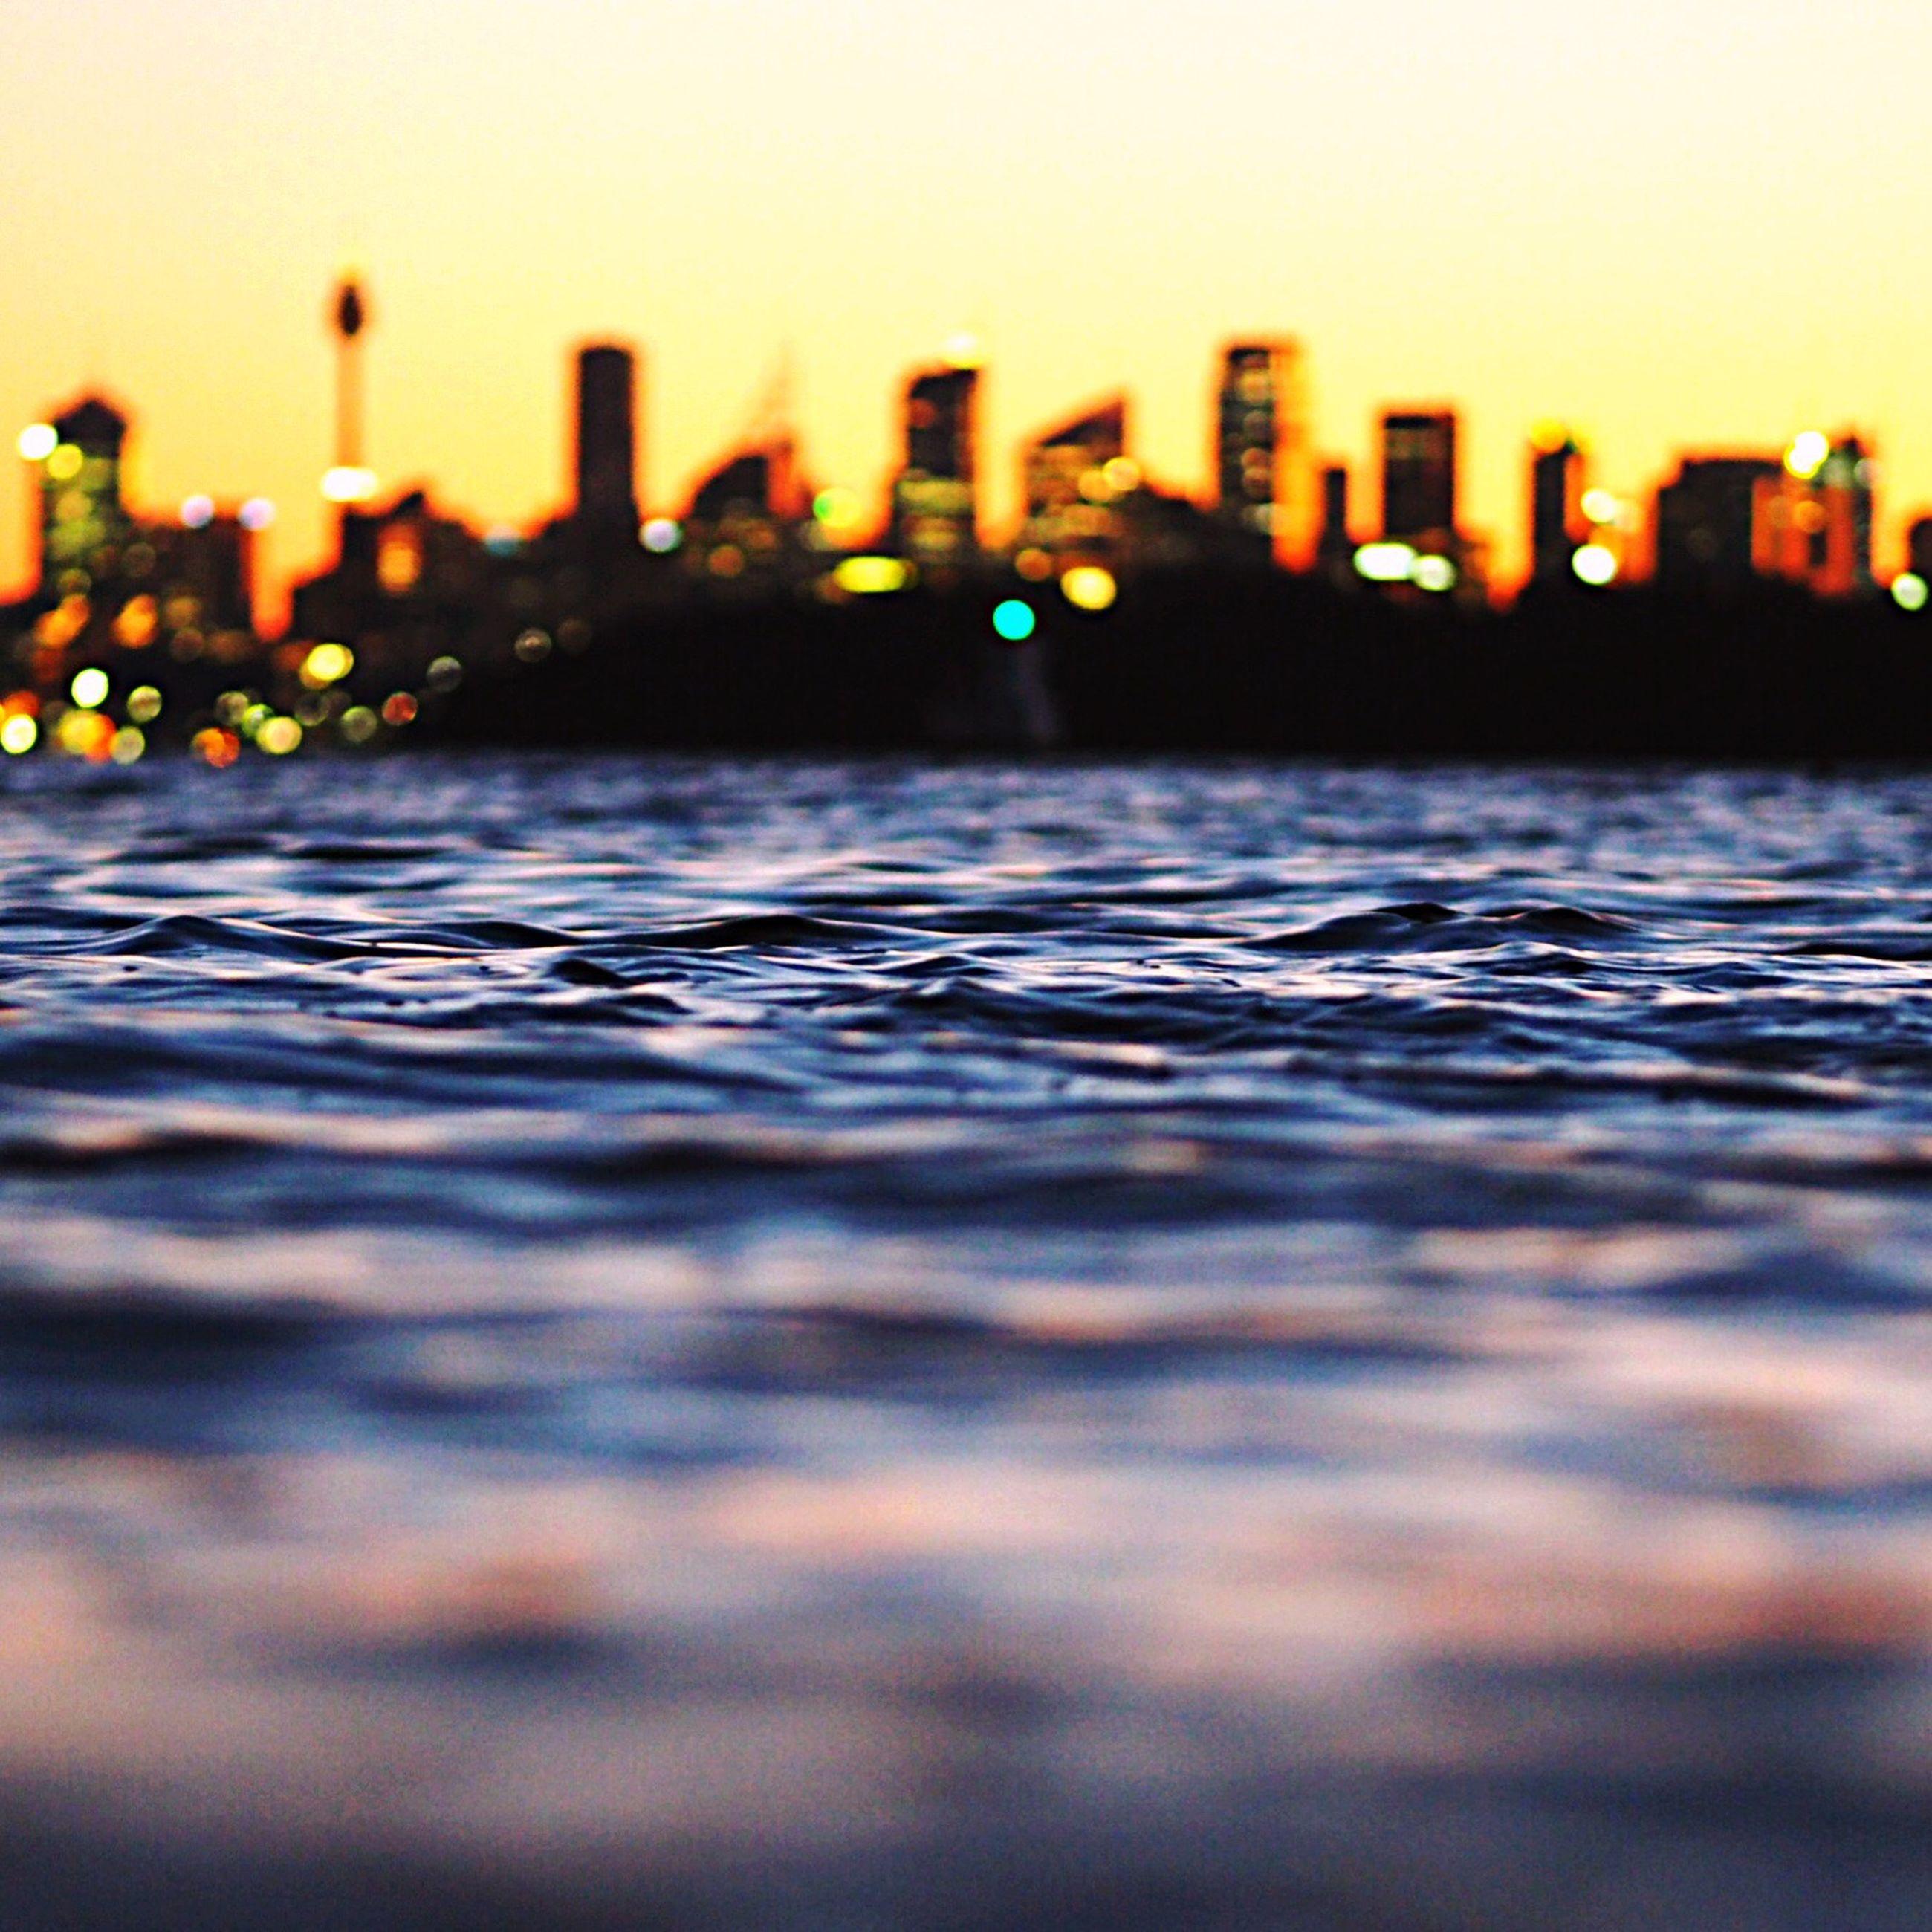 surface level, sunset, selective focus, illuminated, building exterior, sky, outdoors, city life, the way forward, waterfront